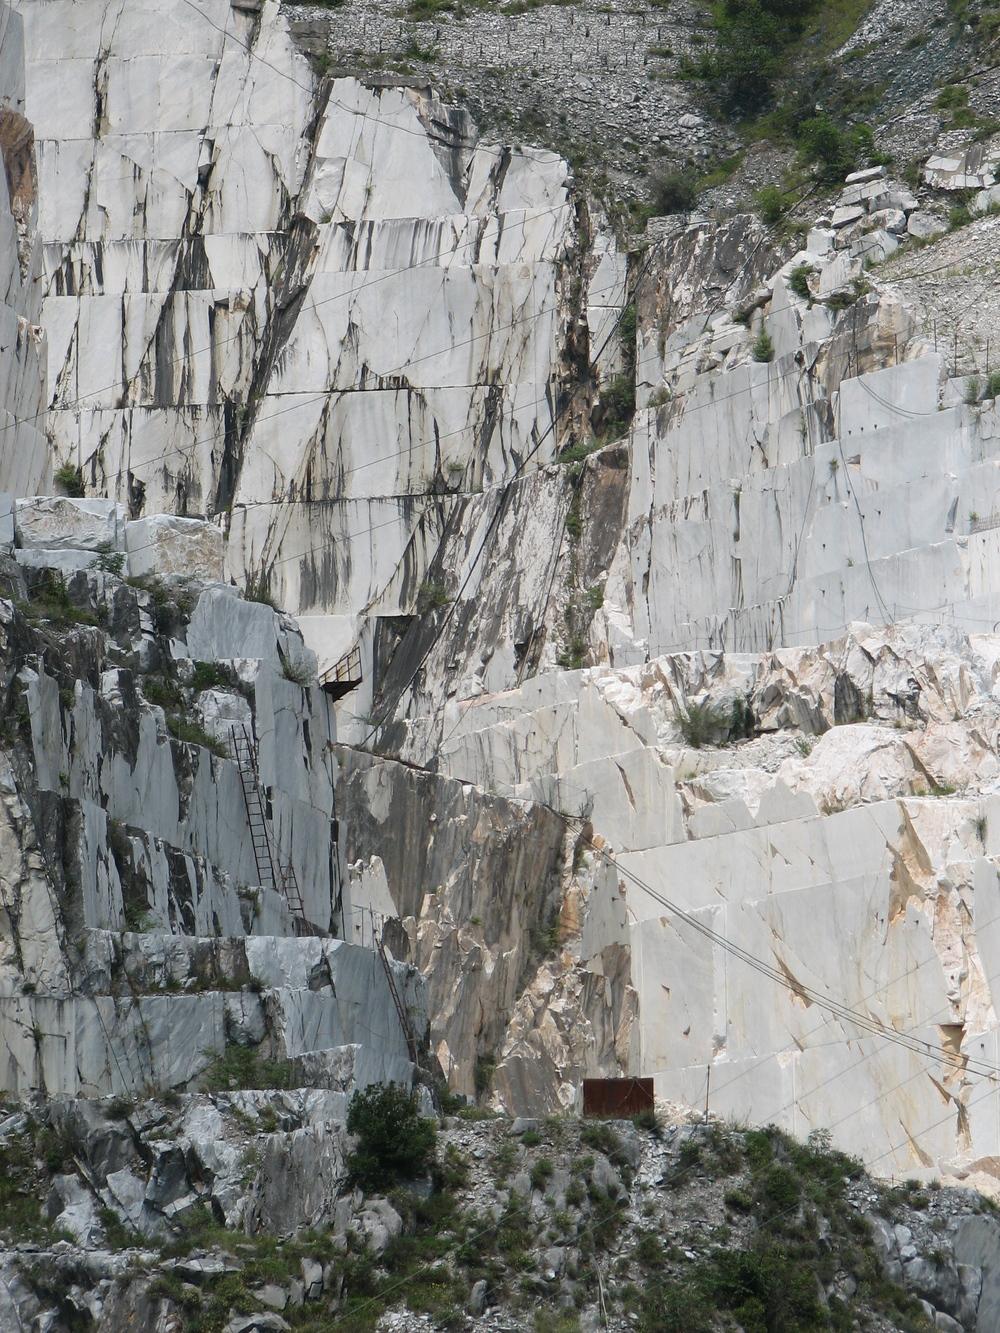 Massa Carrara marble mine